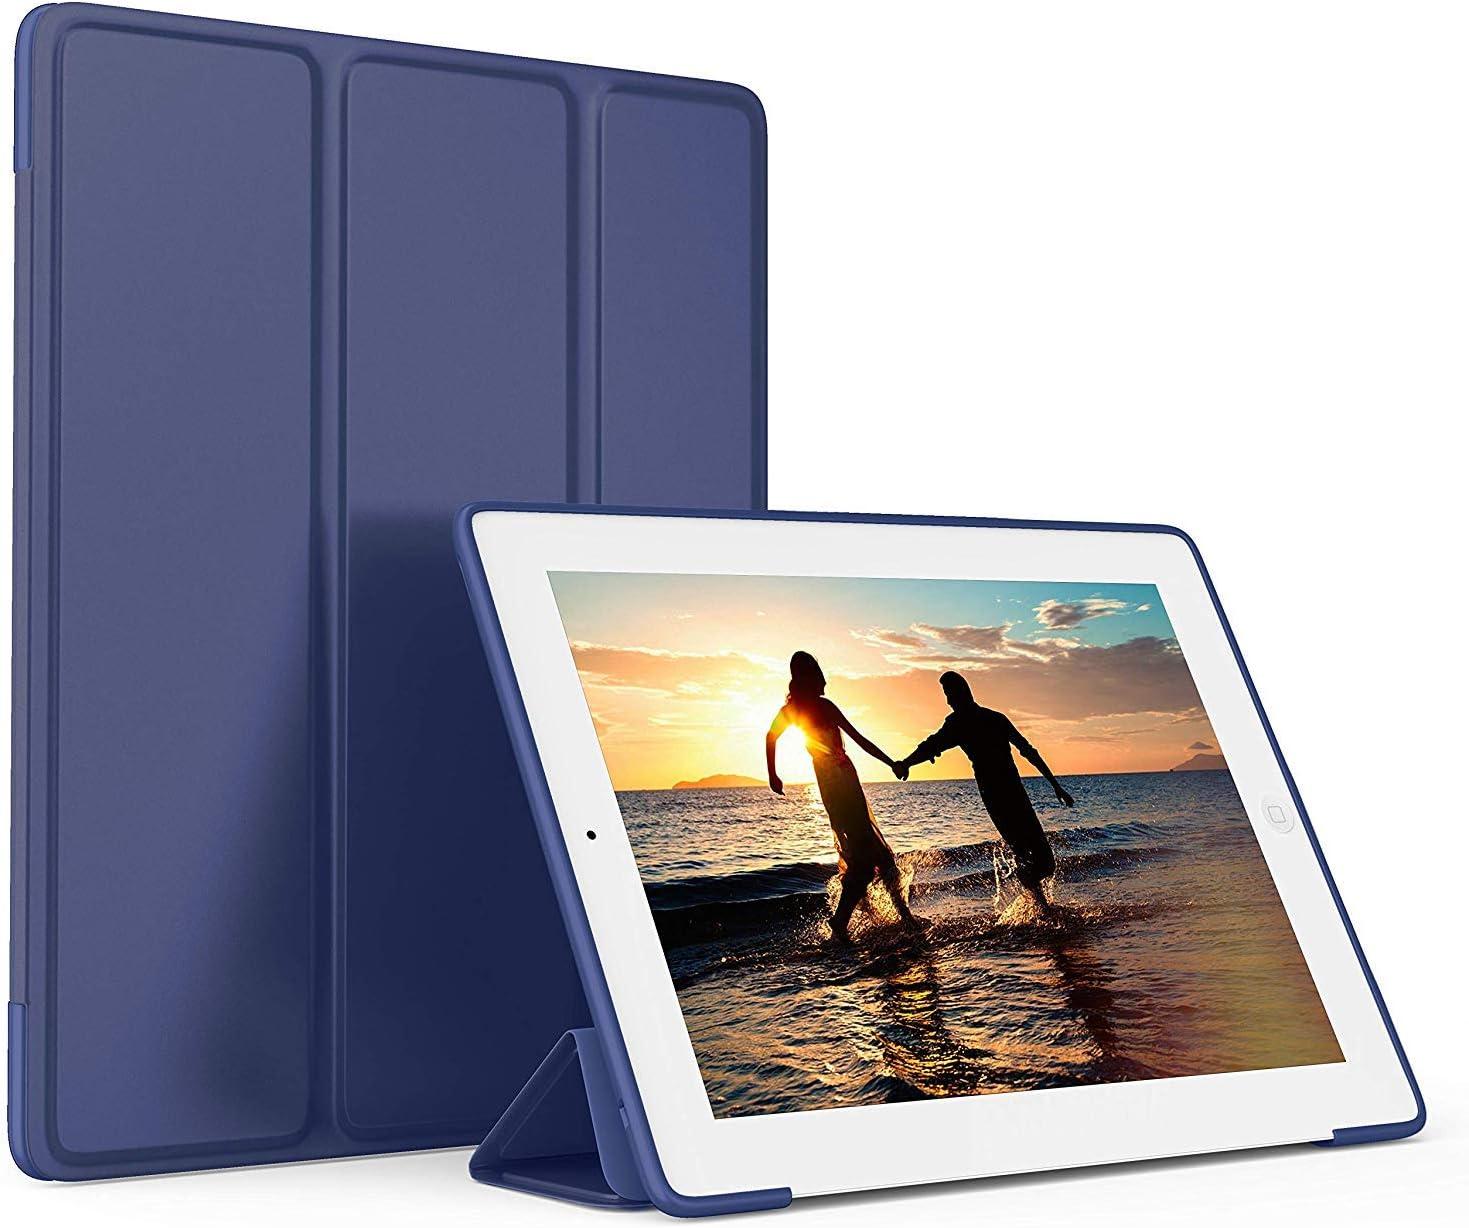 iPad 2 Case, iPad 3 Case, iPad 4 Case with Pencil Holder;Ultra Slim Lightweight Smart Case TPU Soft Silicone Stand with Auto Sleep/Wake for iPad2/3/4 (Blue)